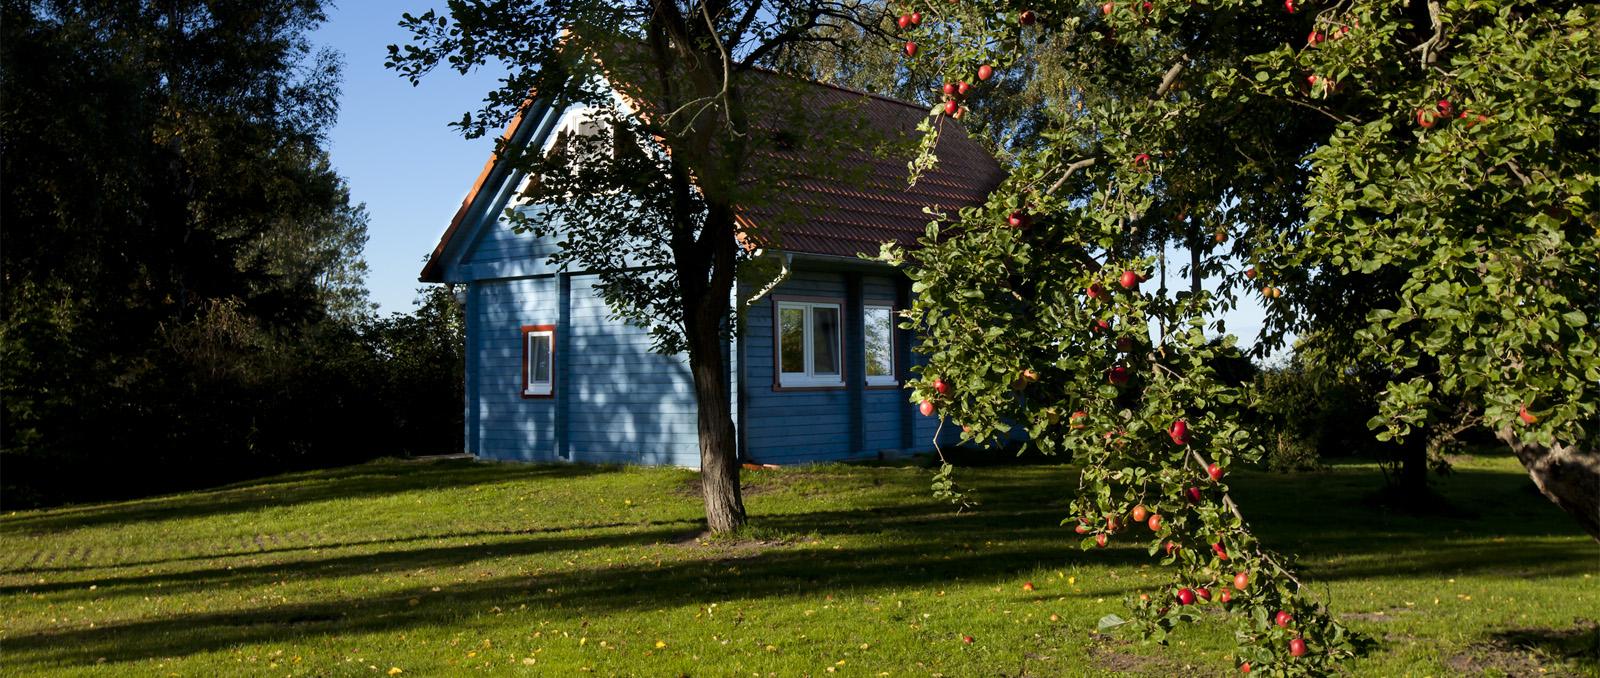 Haus Kranichblick, Garten